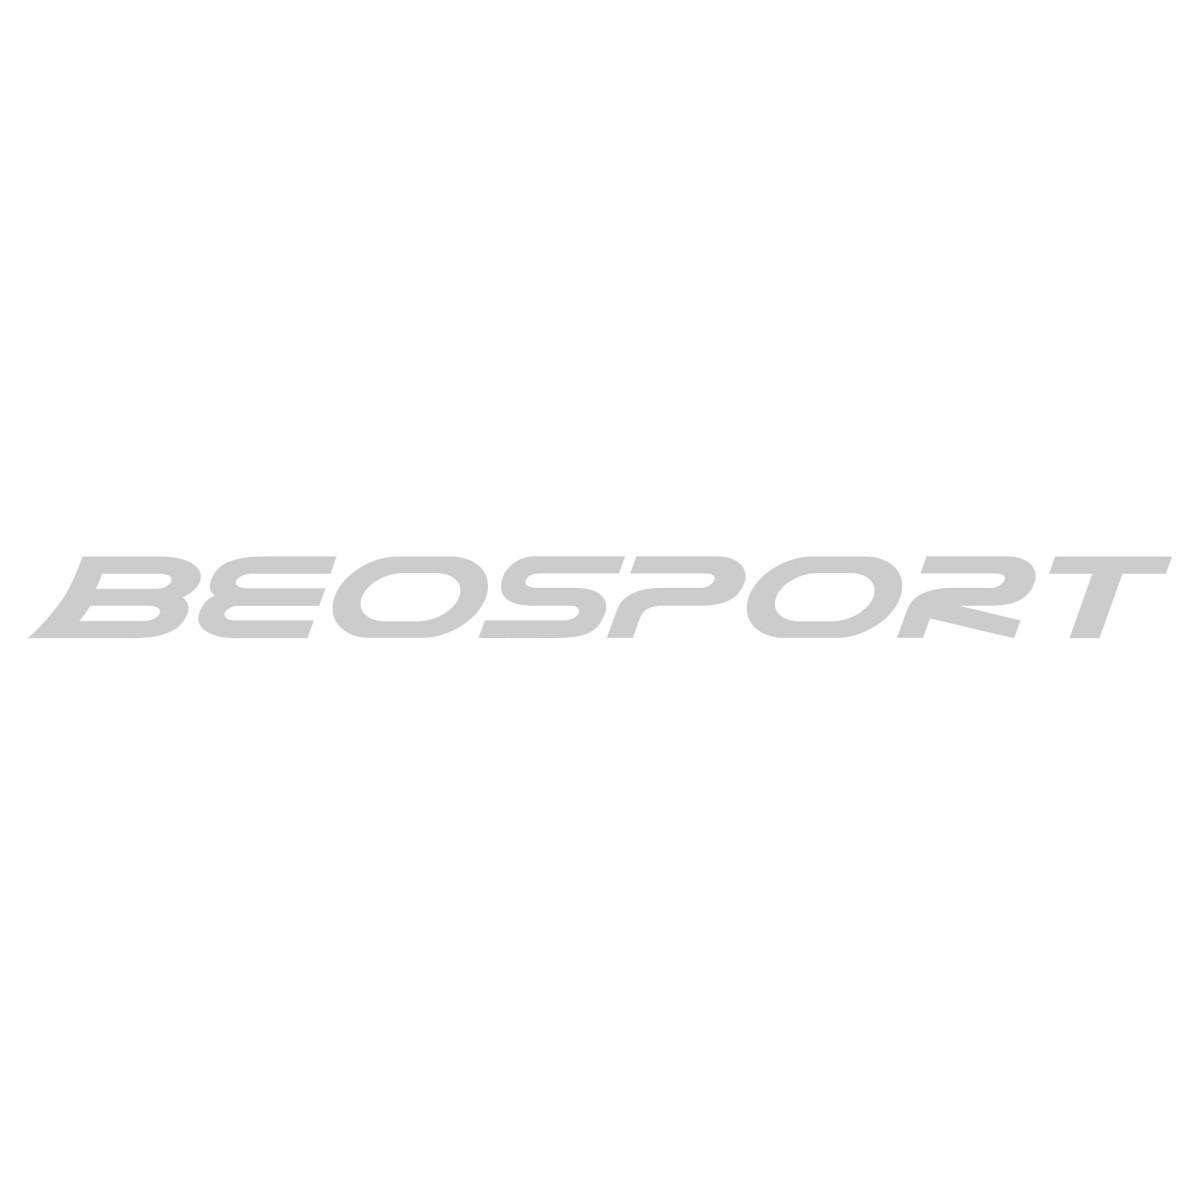 Wilson Roland Garros 4 loptice za tenis